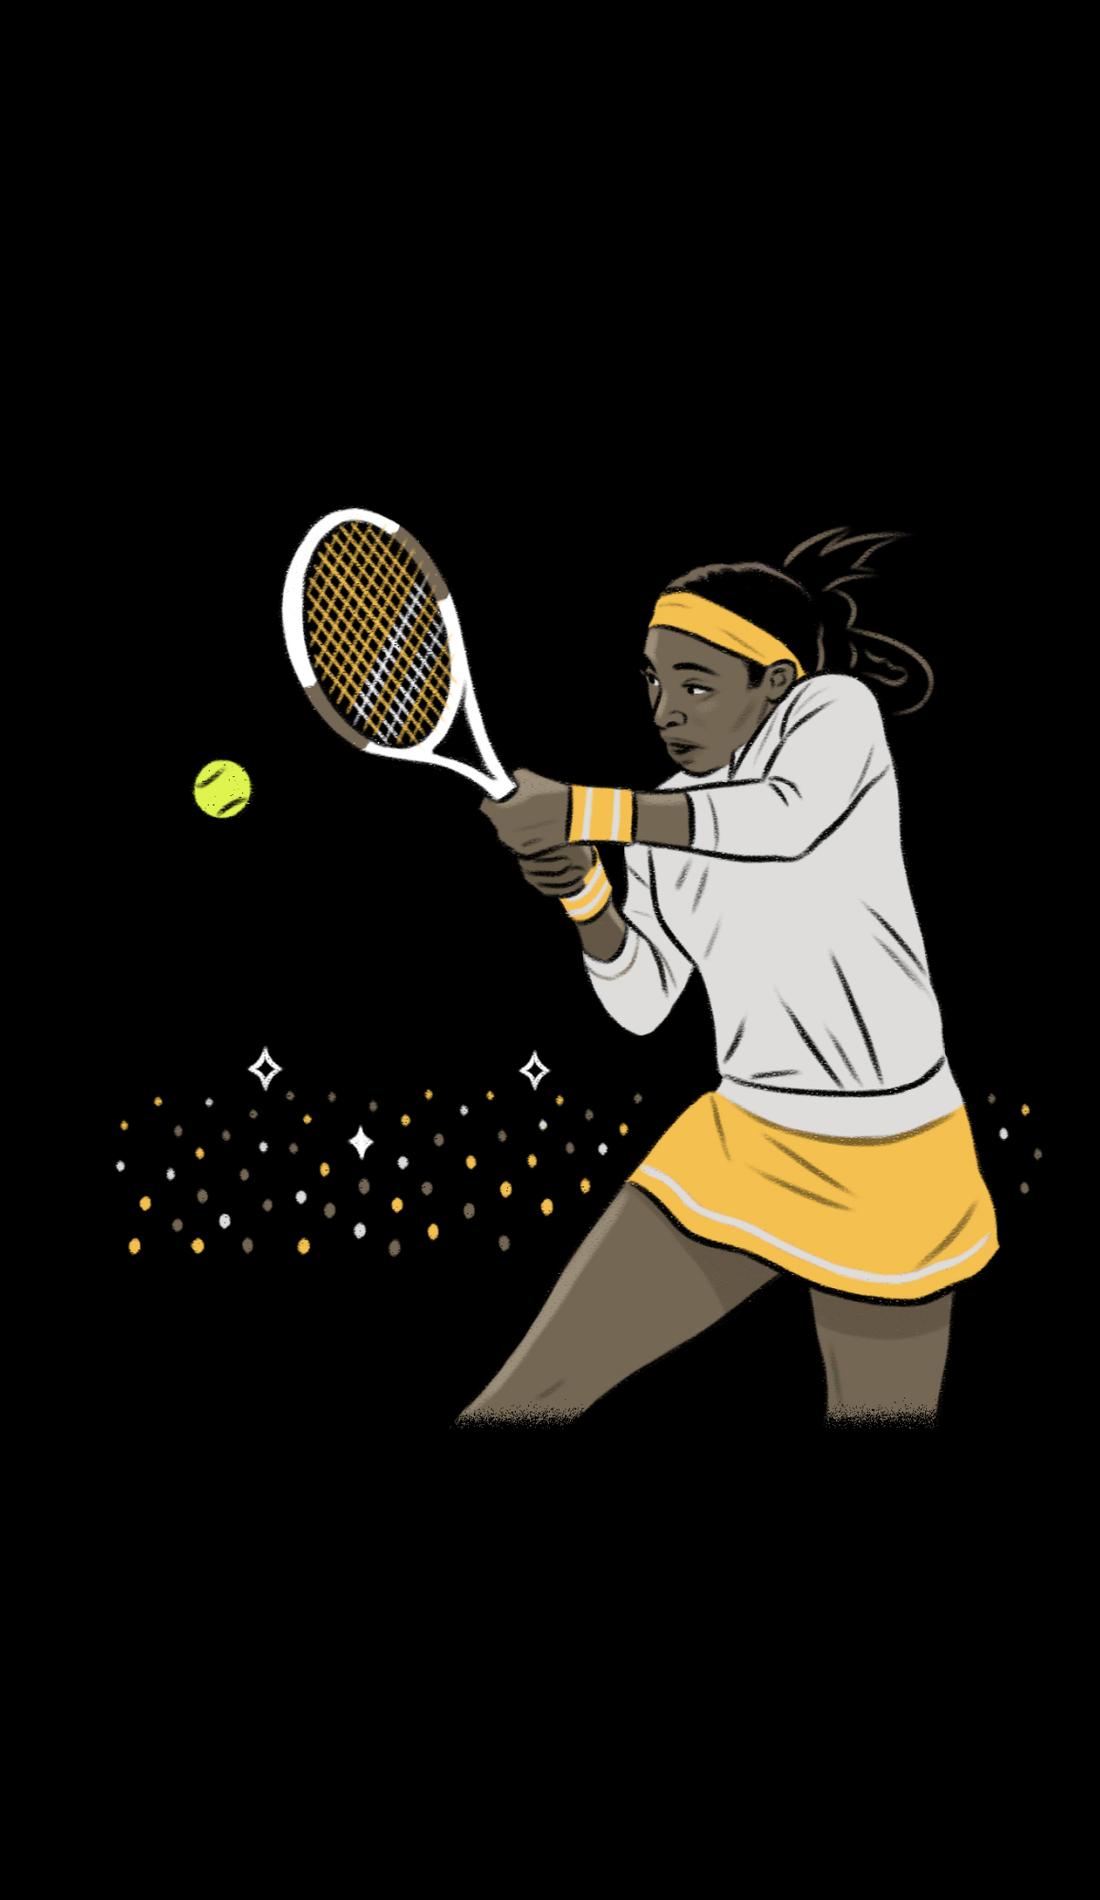 A Barclays ATP World Tour Finals live event